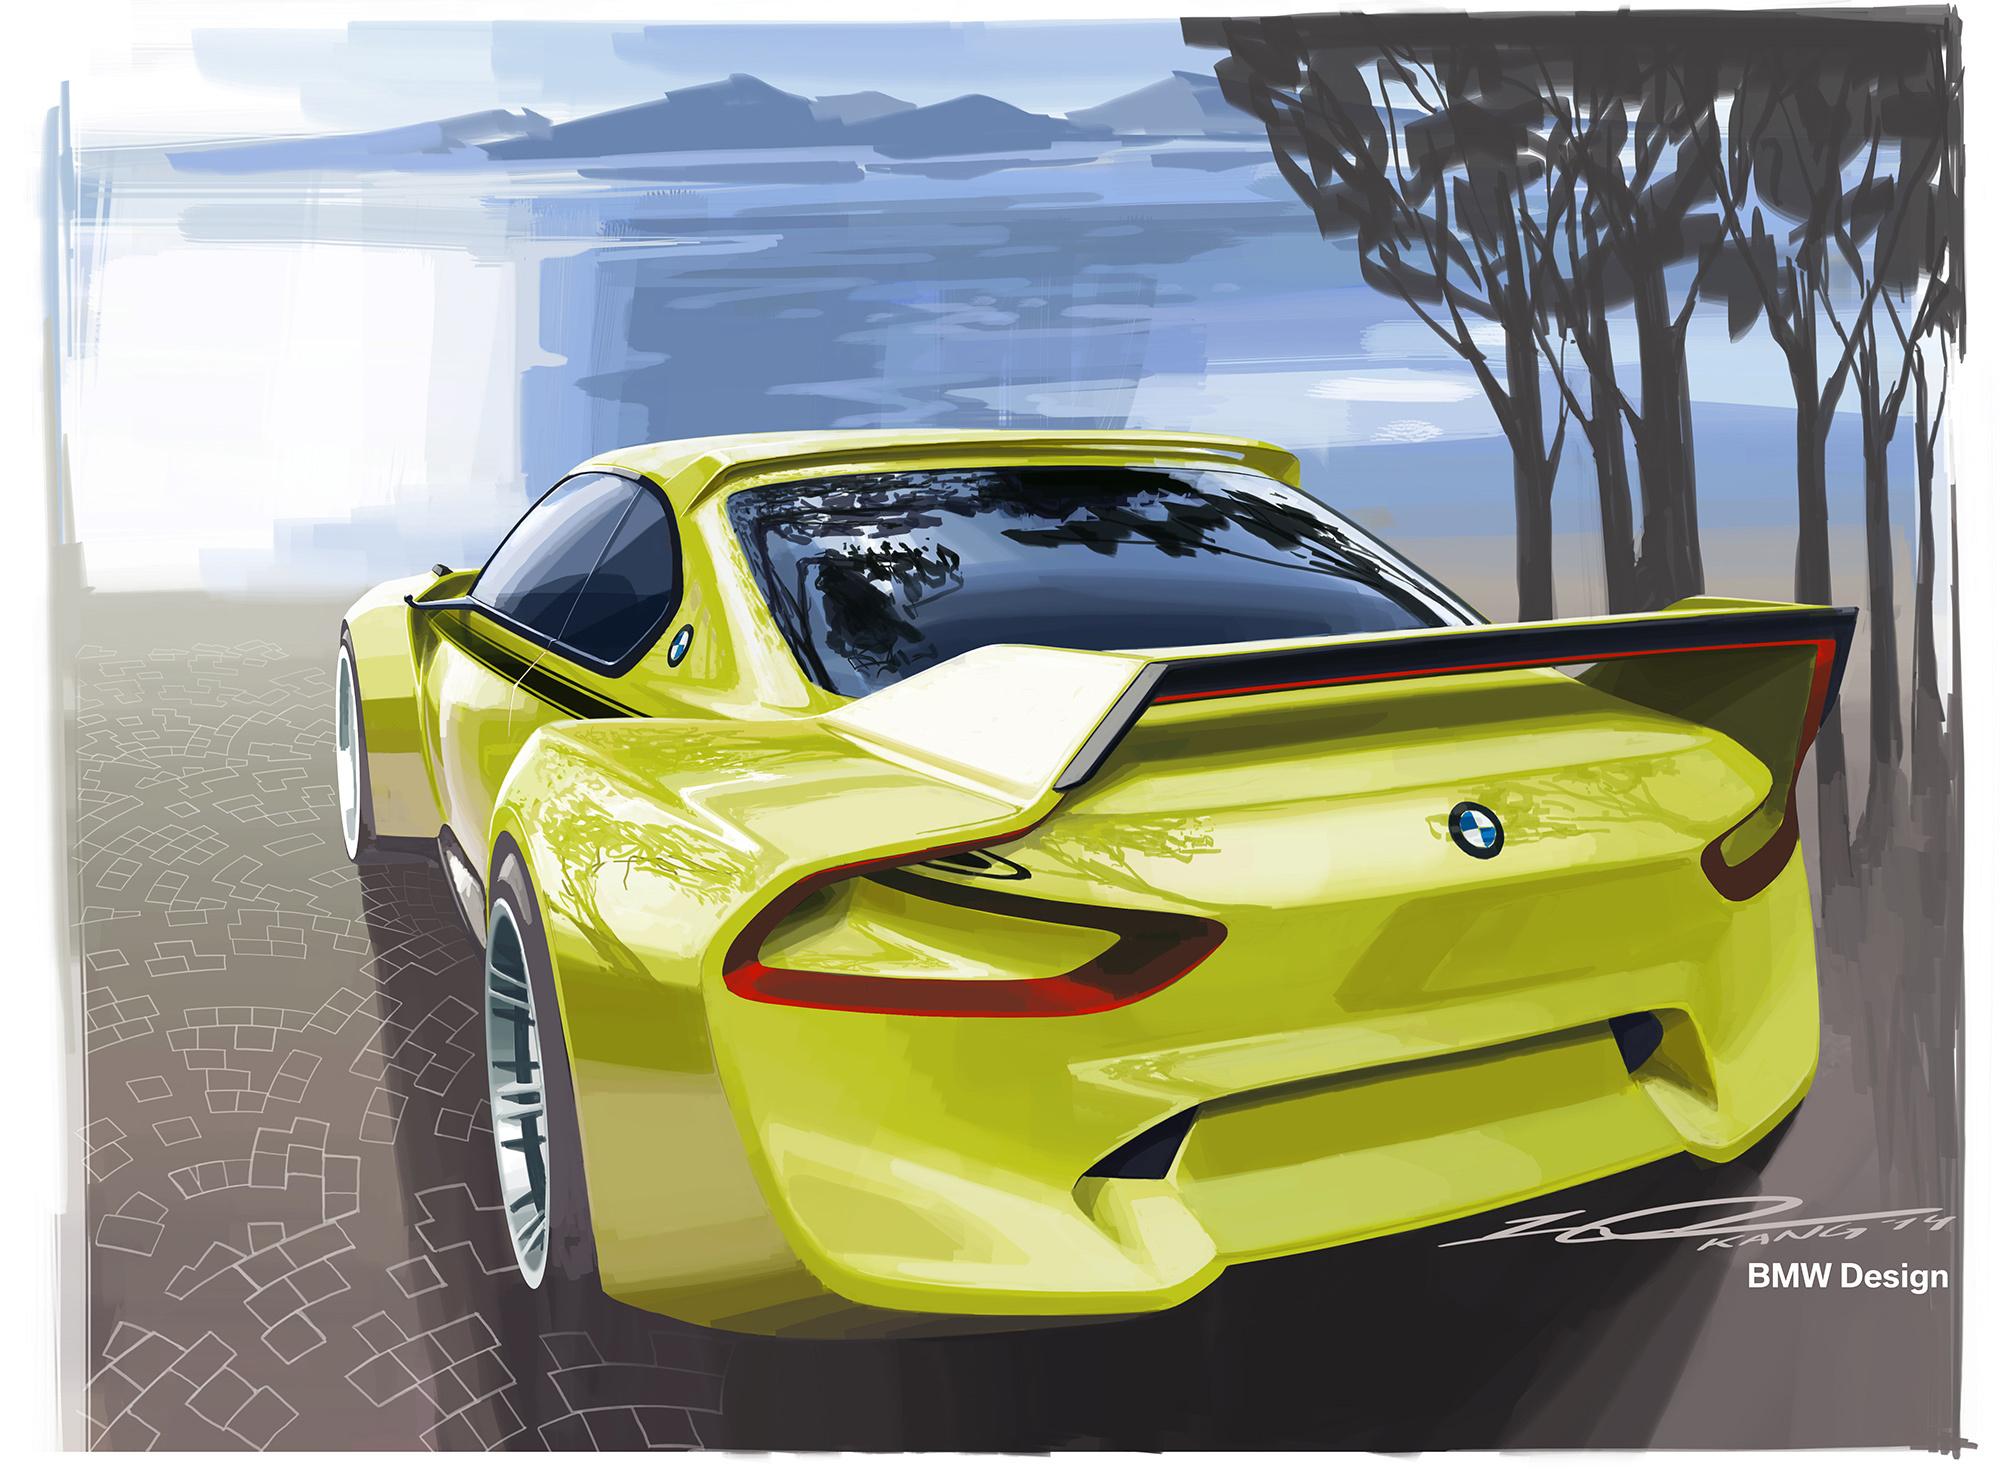 BMW 3.0 CSL Hommage Concept HD Background